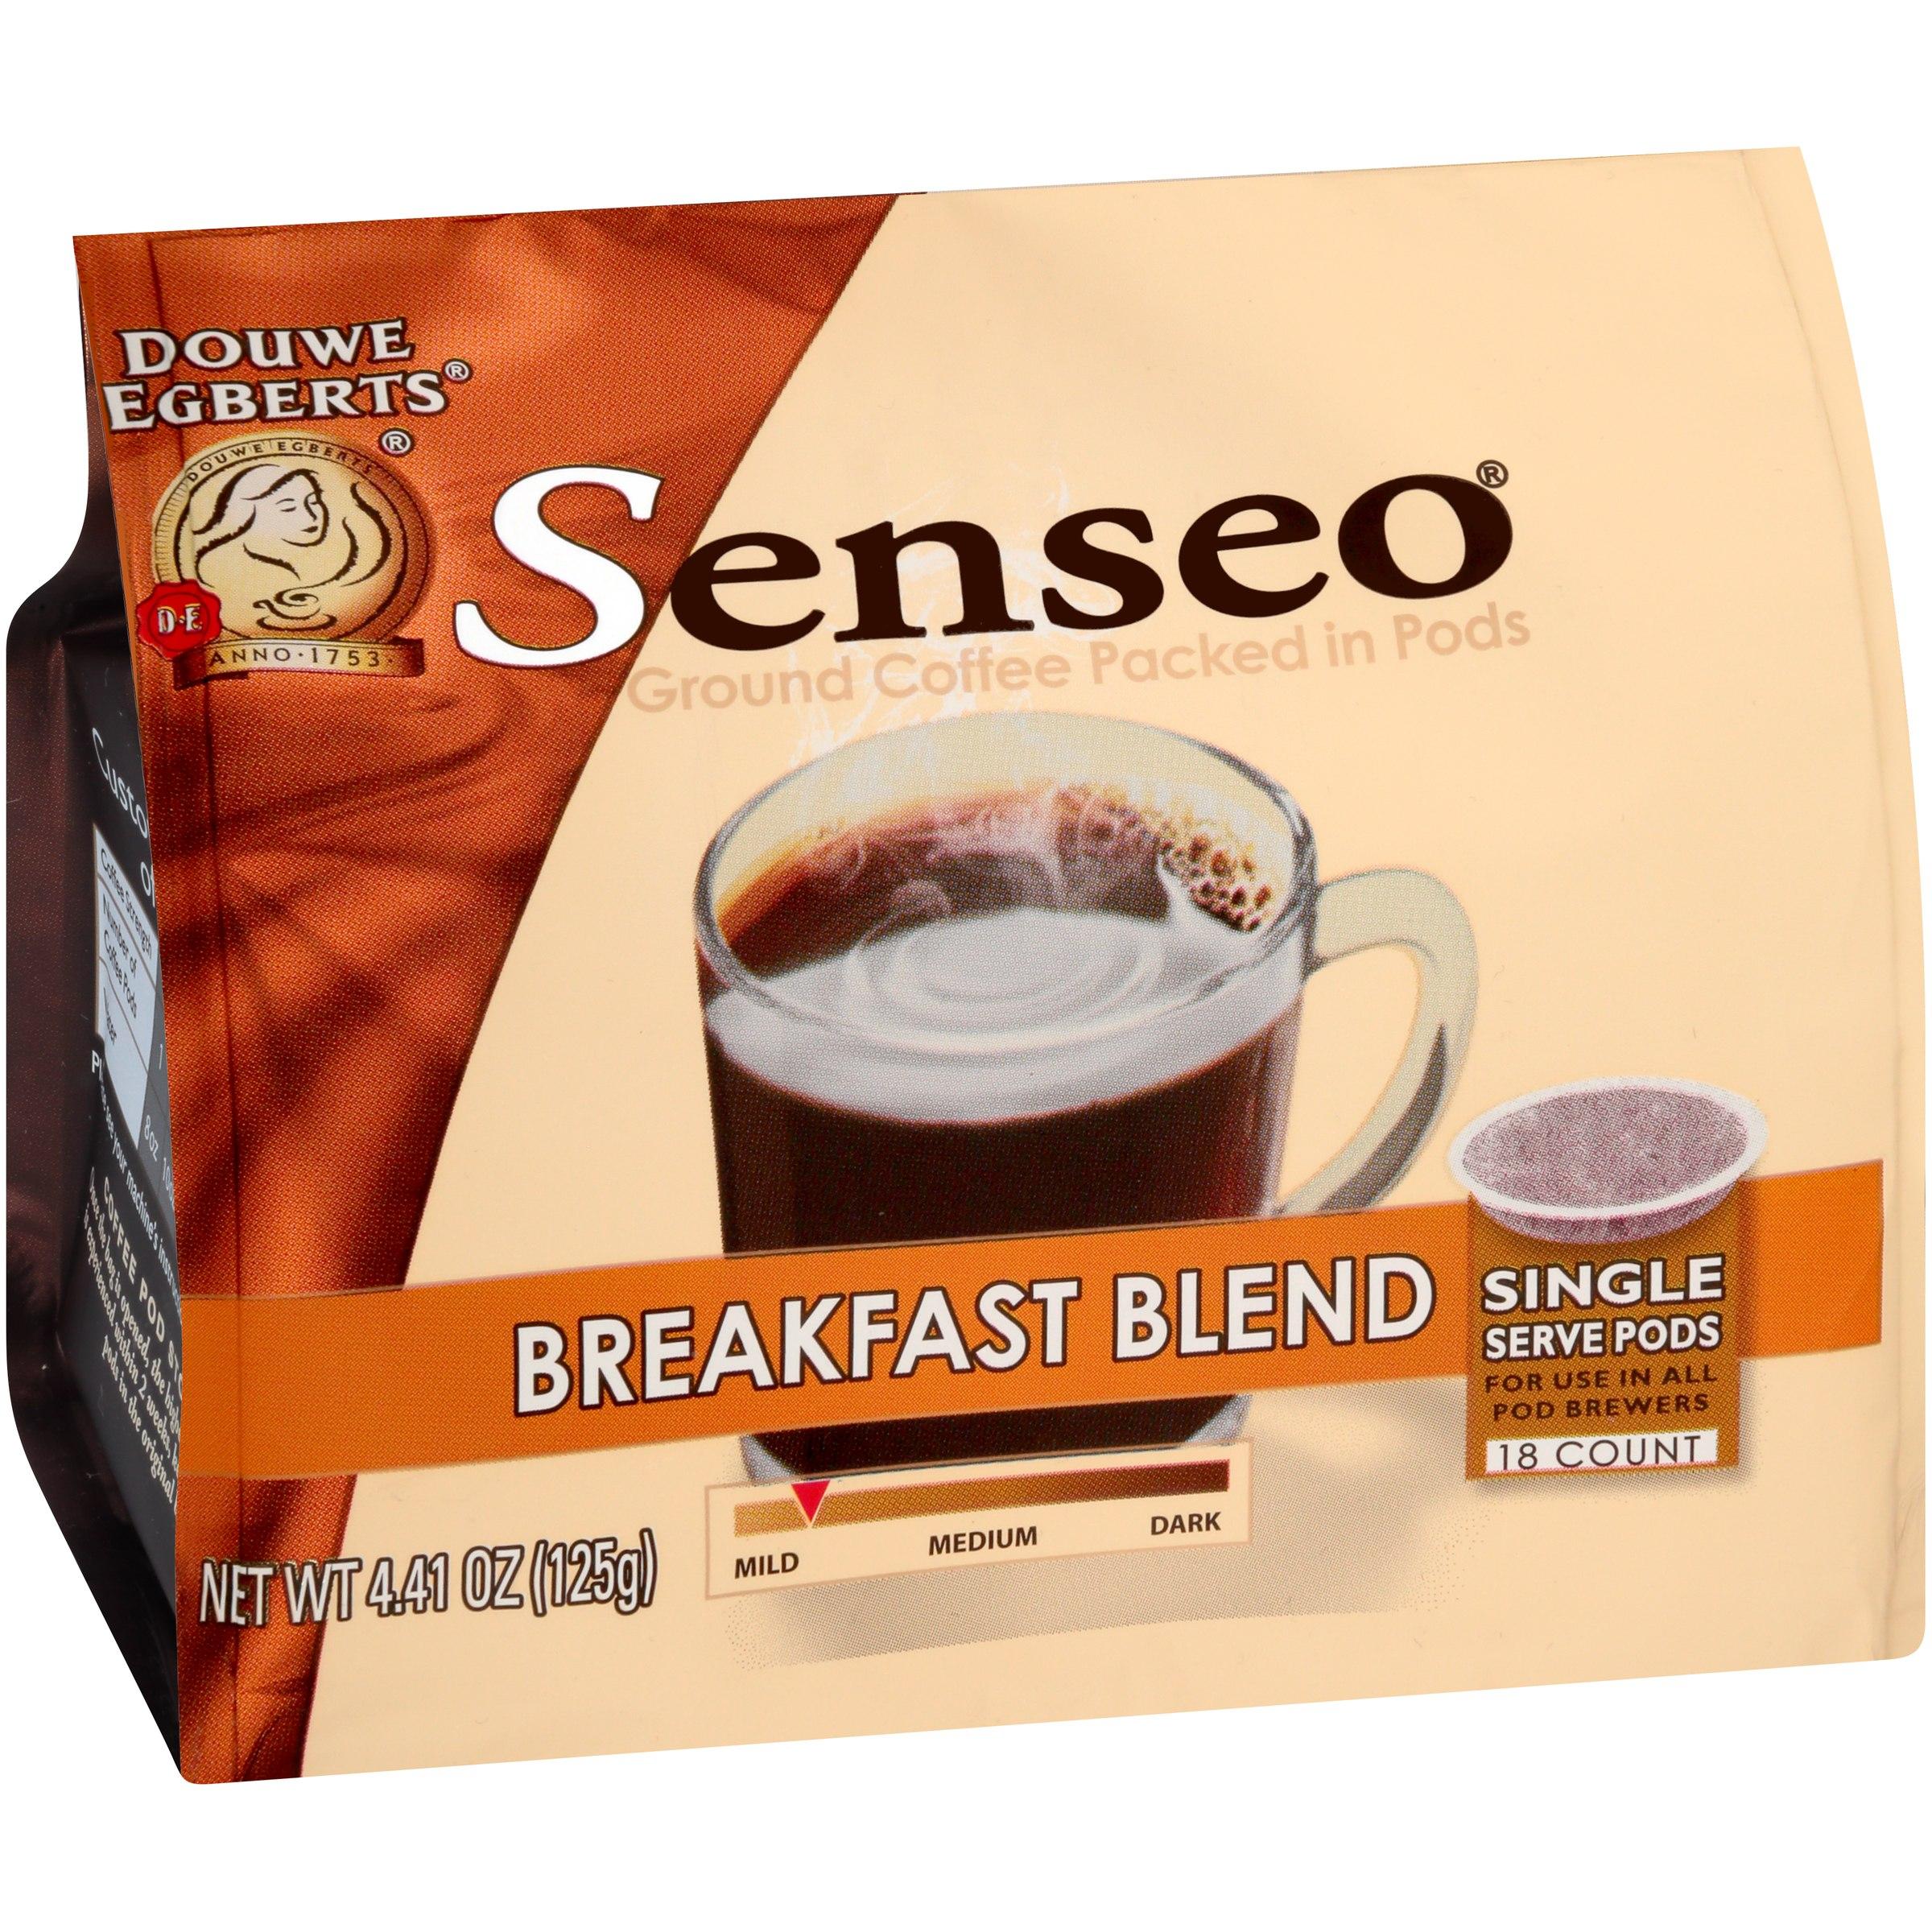 Senseo® Breakfast Blend Ground Coffee 18 ct Single Serve Pods 4.41 oz. Bag